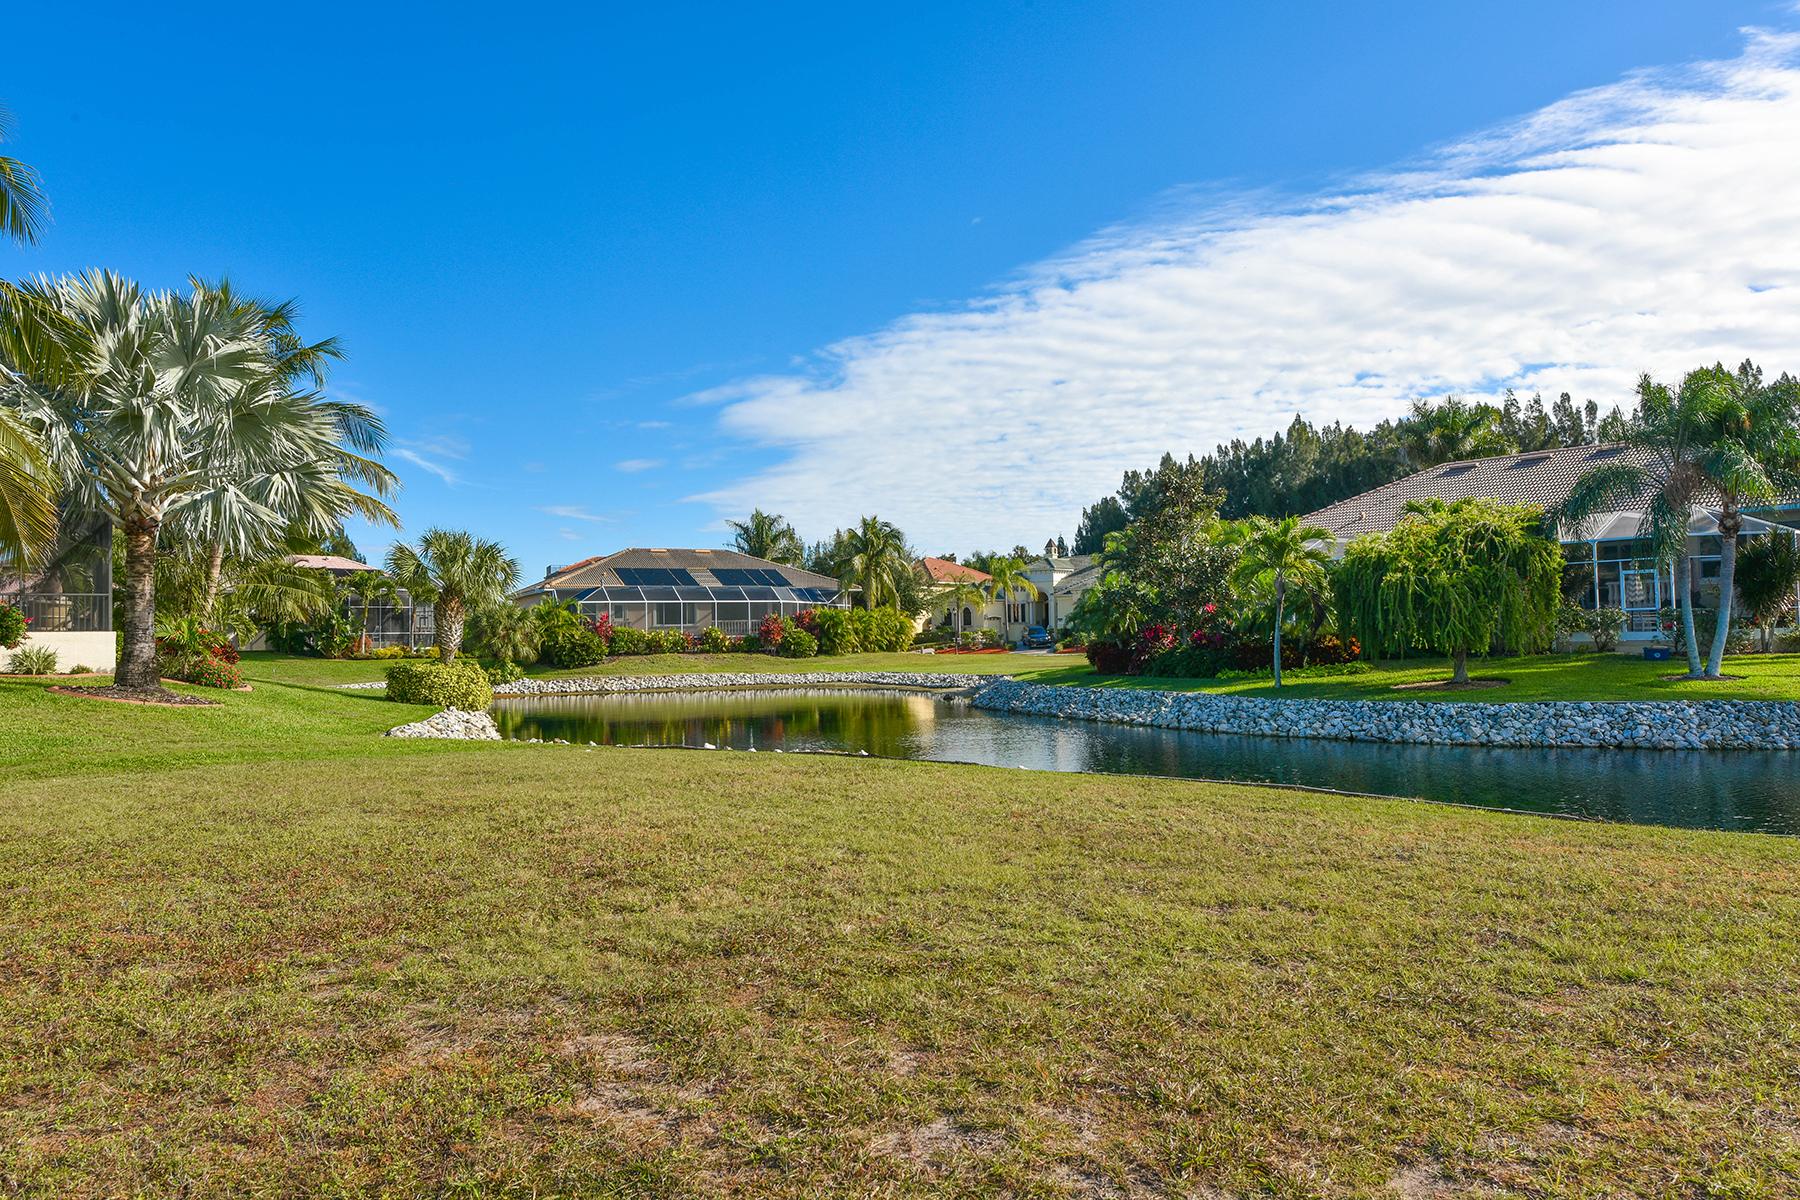 Đất đai vì Bán tại HARBOUR LANDINGS ESTATES 4011 Commodore Blvd 57 Cortez, Florida, 34215 Hoa Kỳ